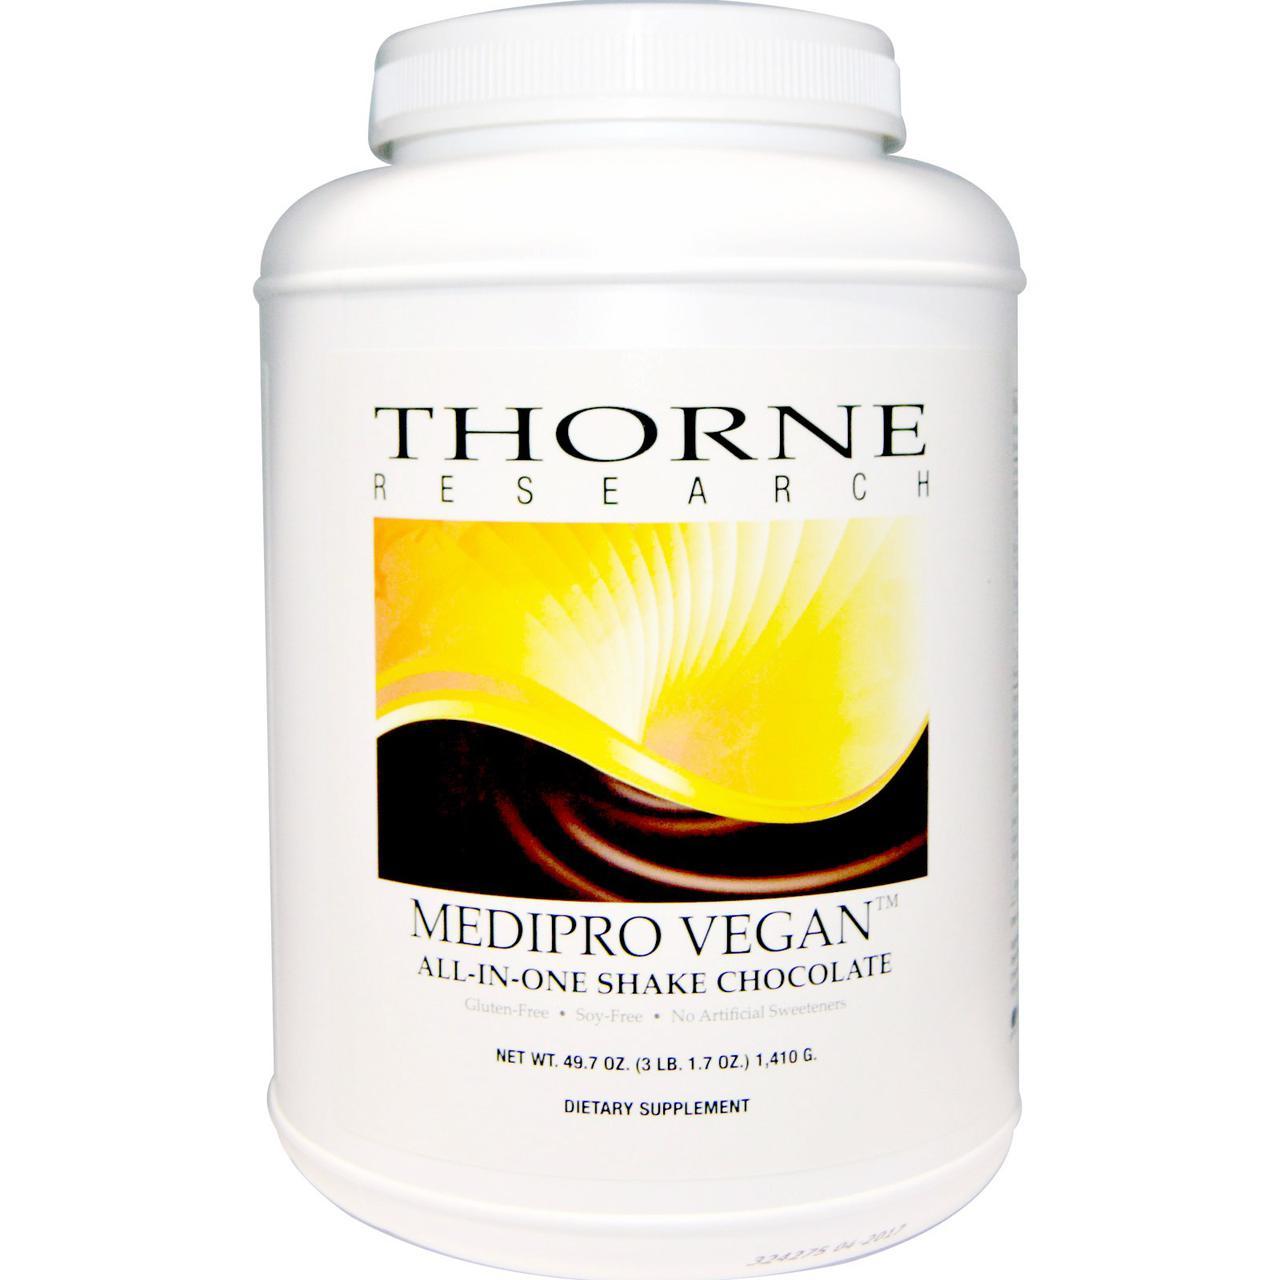 СМульти-комплекс белка (вкус шоколада), Thorne Research, 1,410 г.